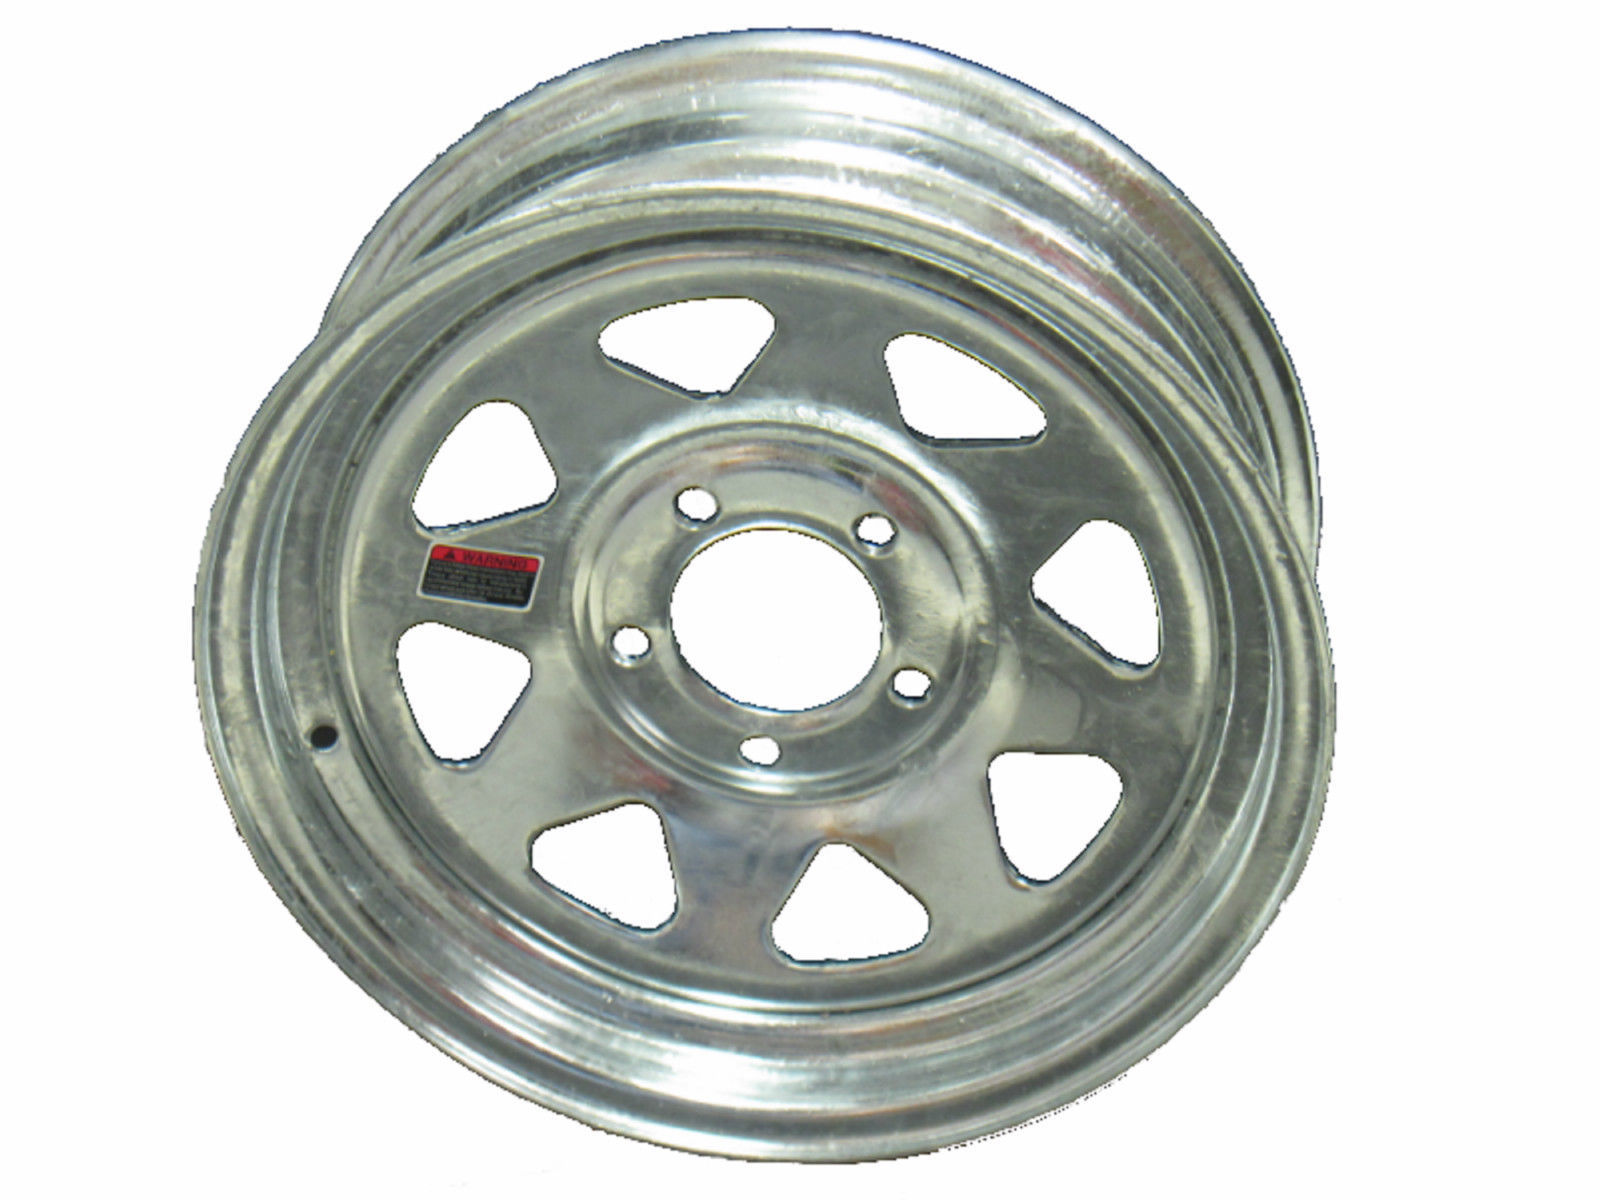 "15"" 5 Lug Galvanized Spoke Steel Trailer Wheel Camper RV Boat Utility Wheel"